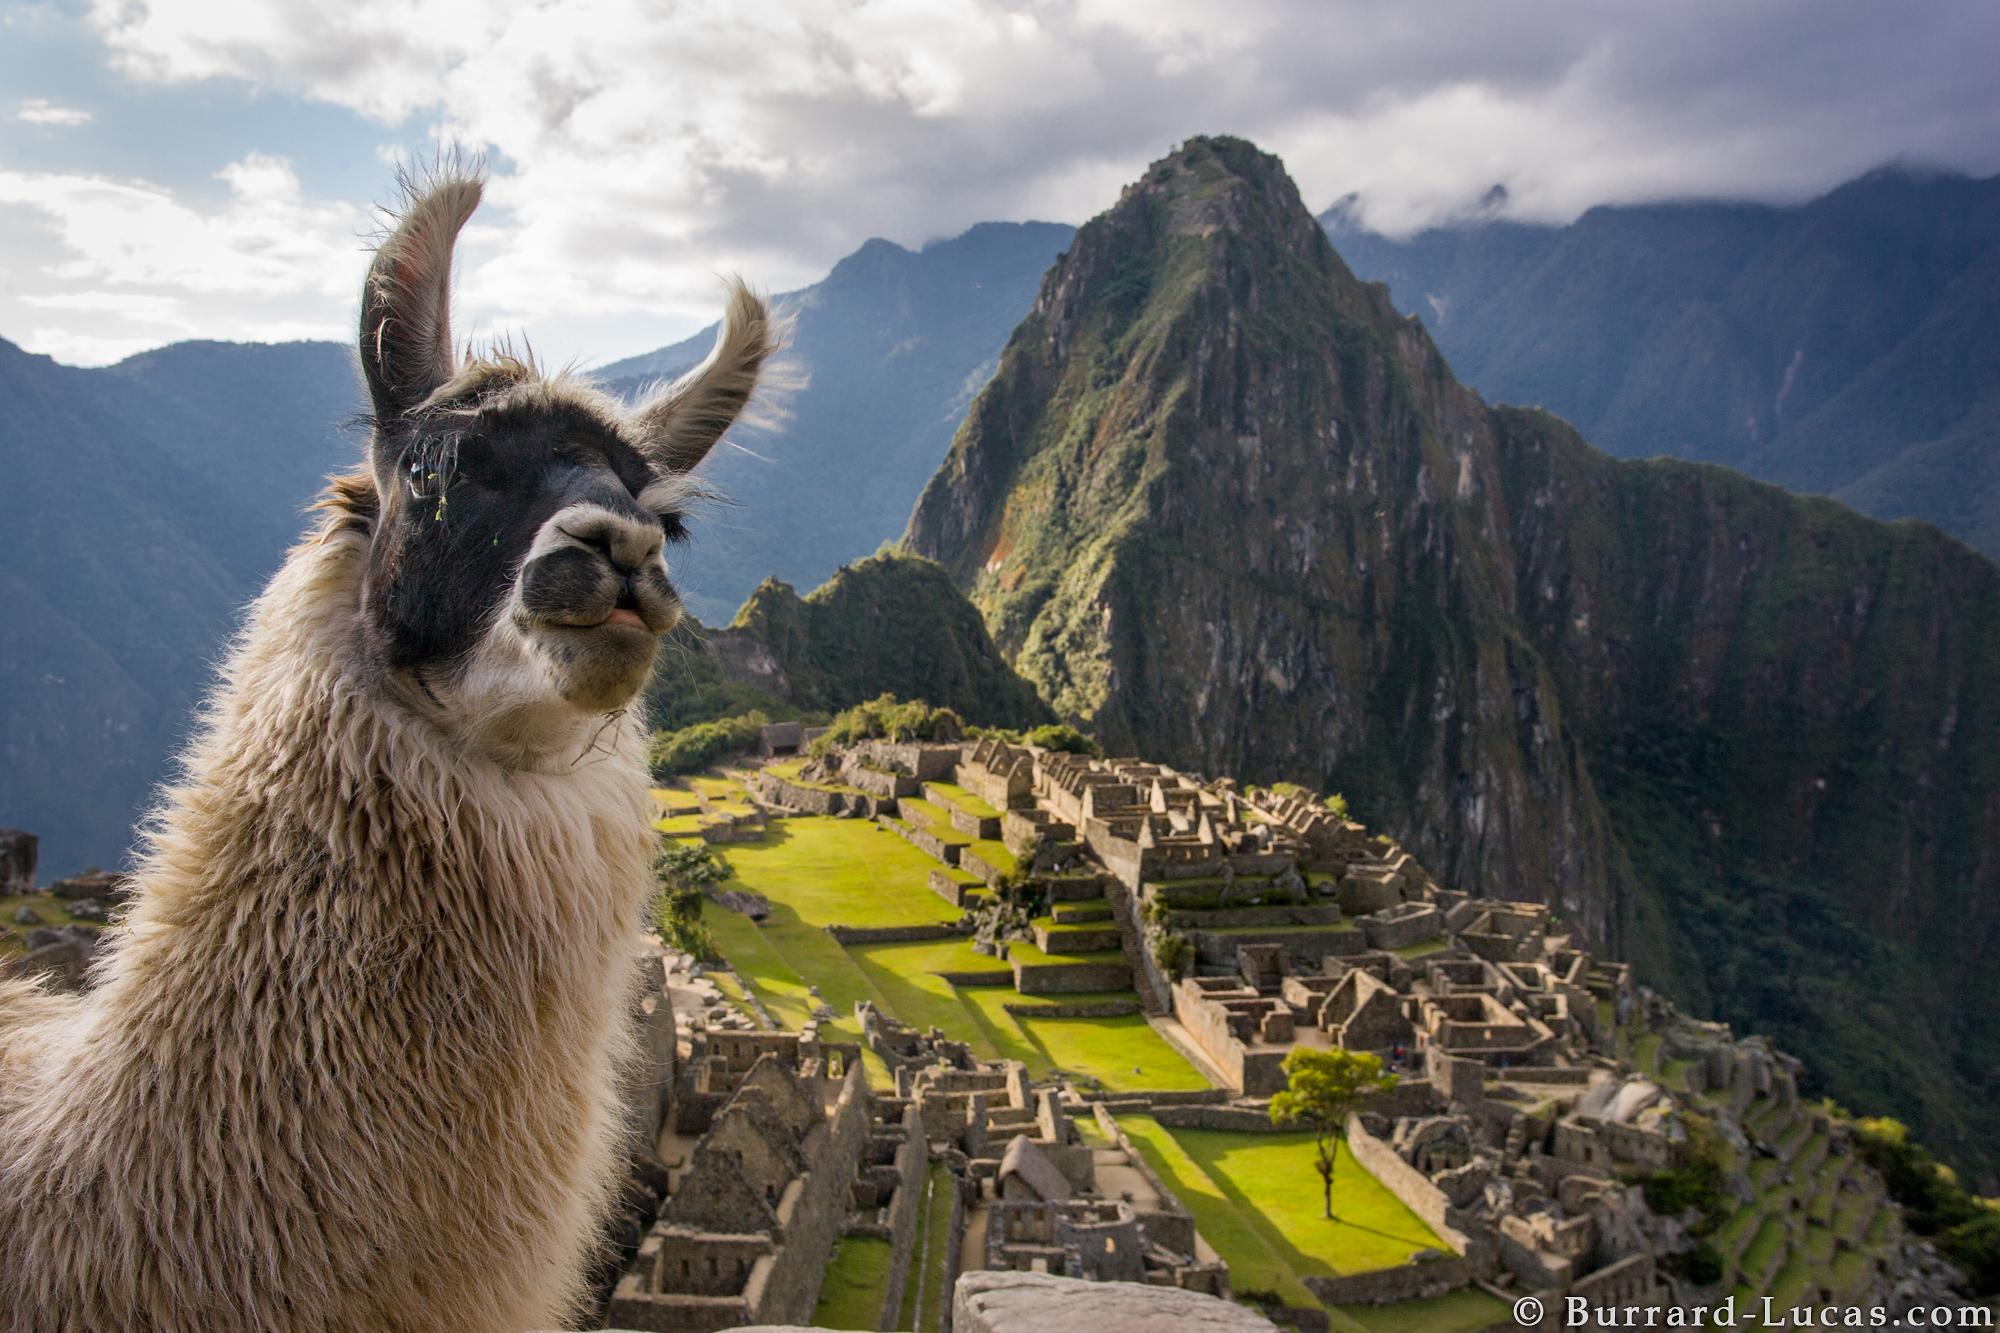 Llama photobomb at Machu Picchu! - Imgur